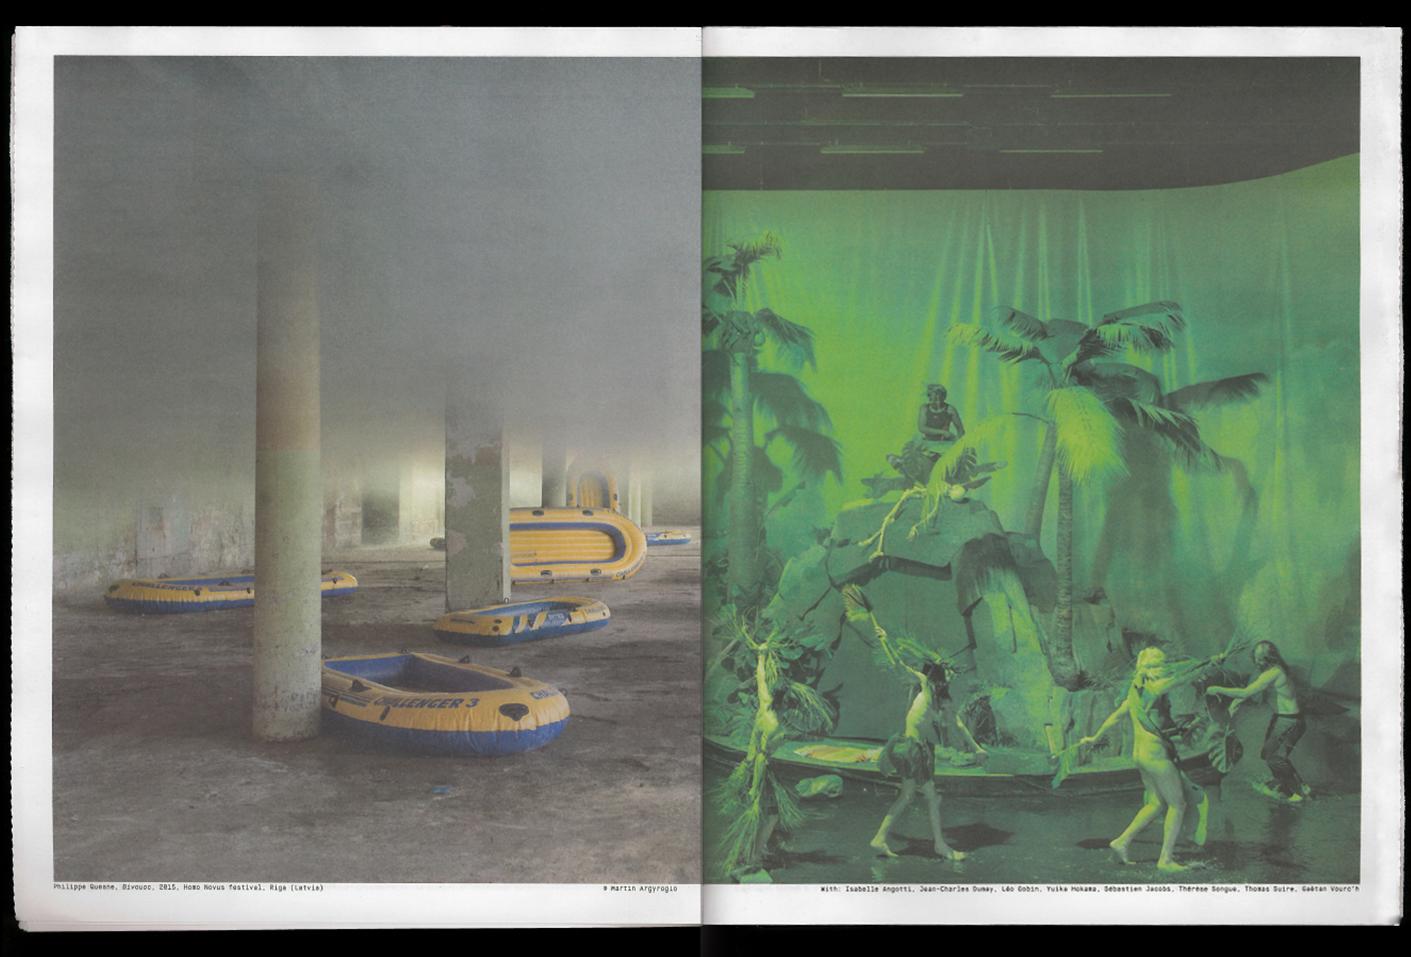 Philippe Quesne: Microcosm — Lisa Sturacci Graphiste